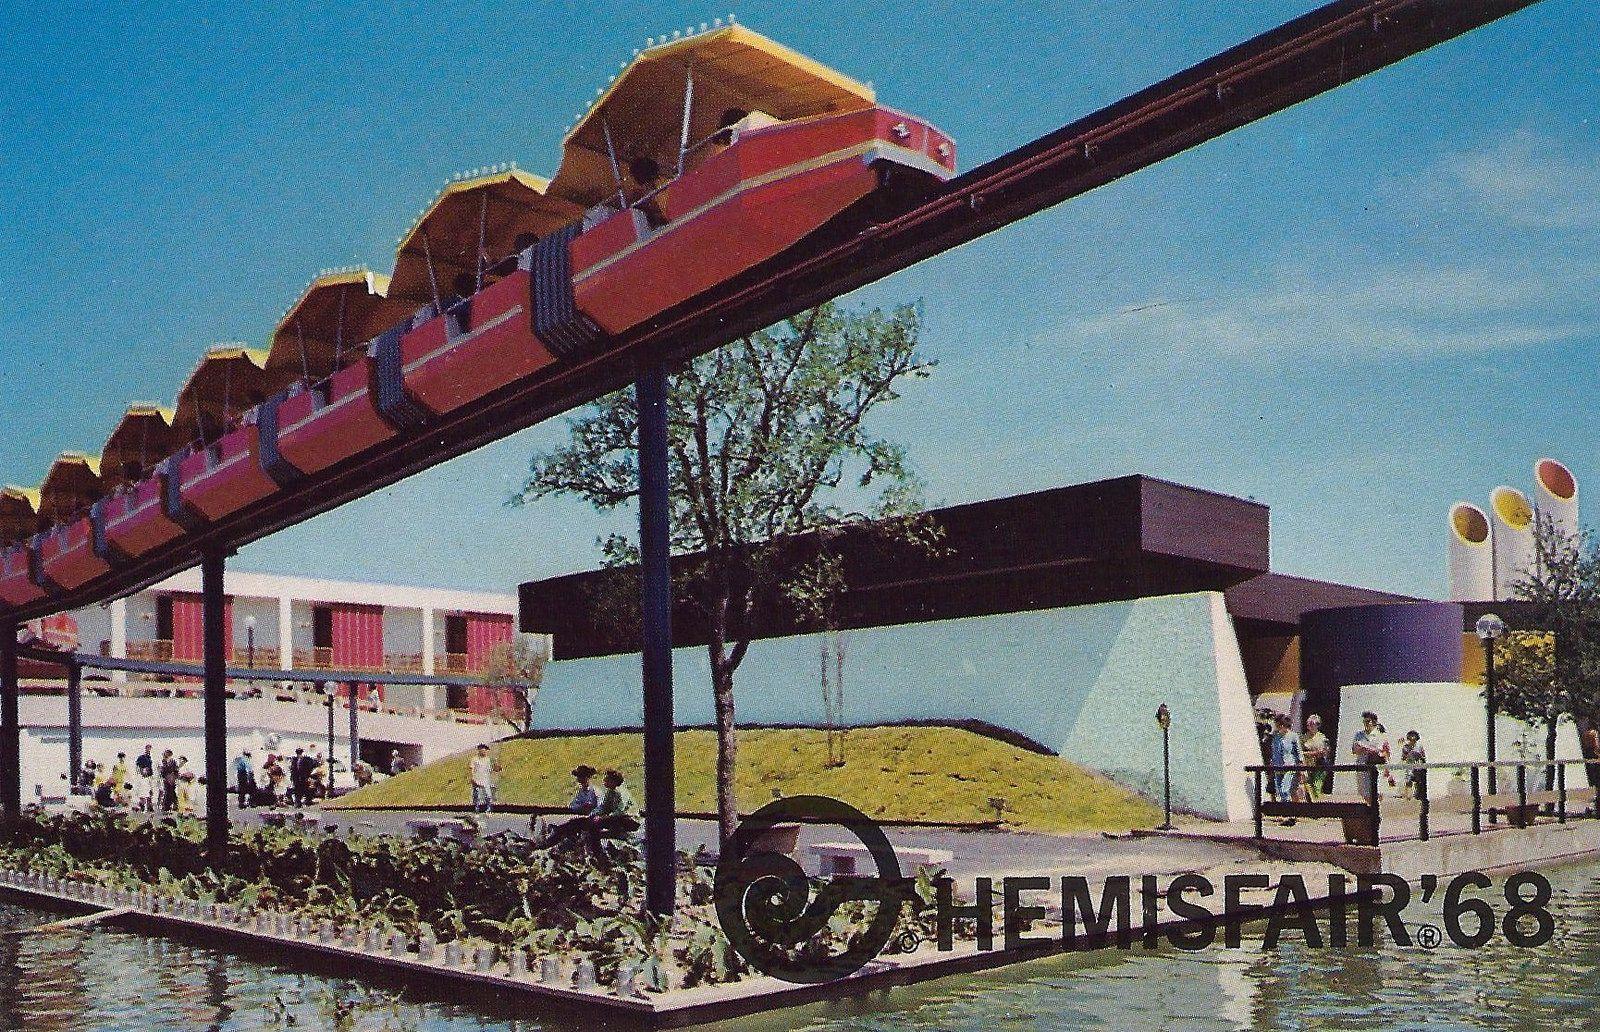 The 1968 World S Fair Hemisfair 68 Held In San Antonio